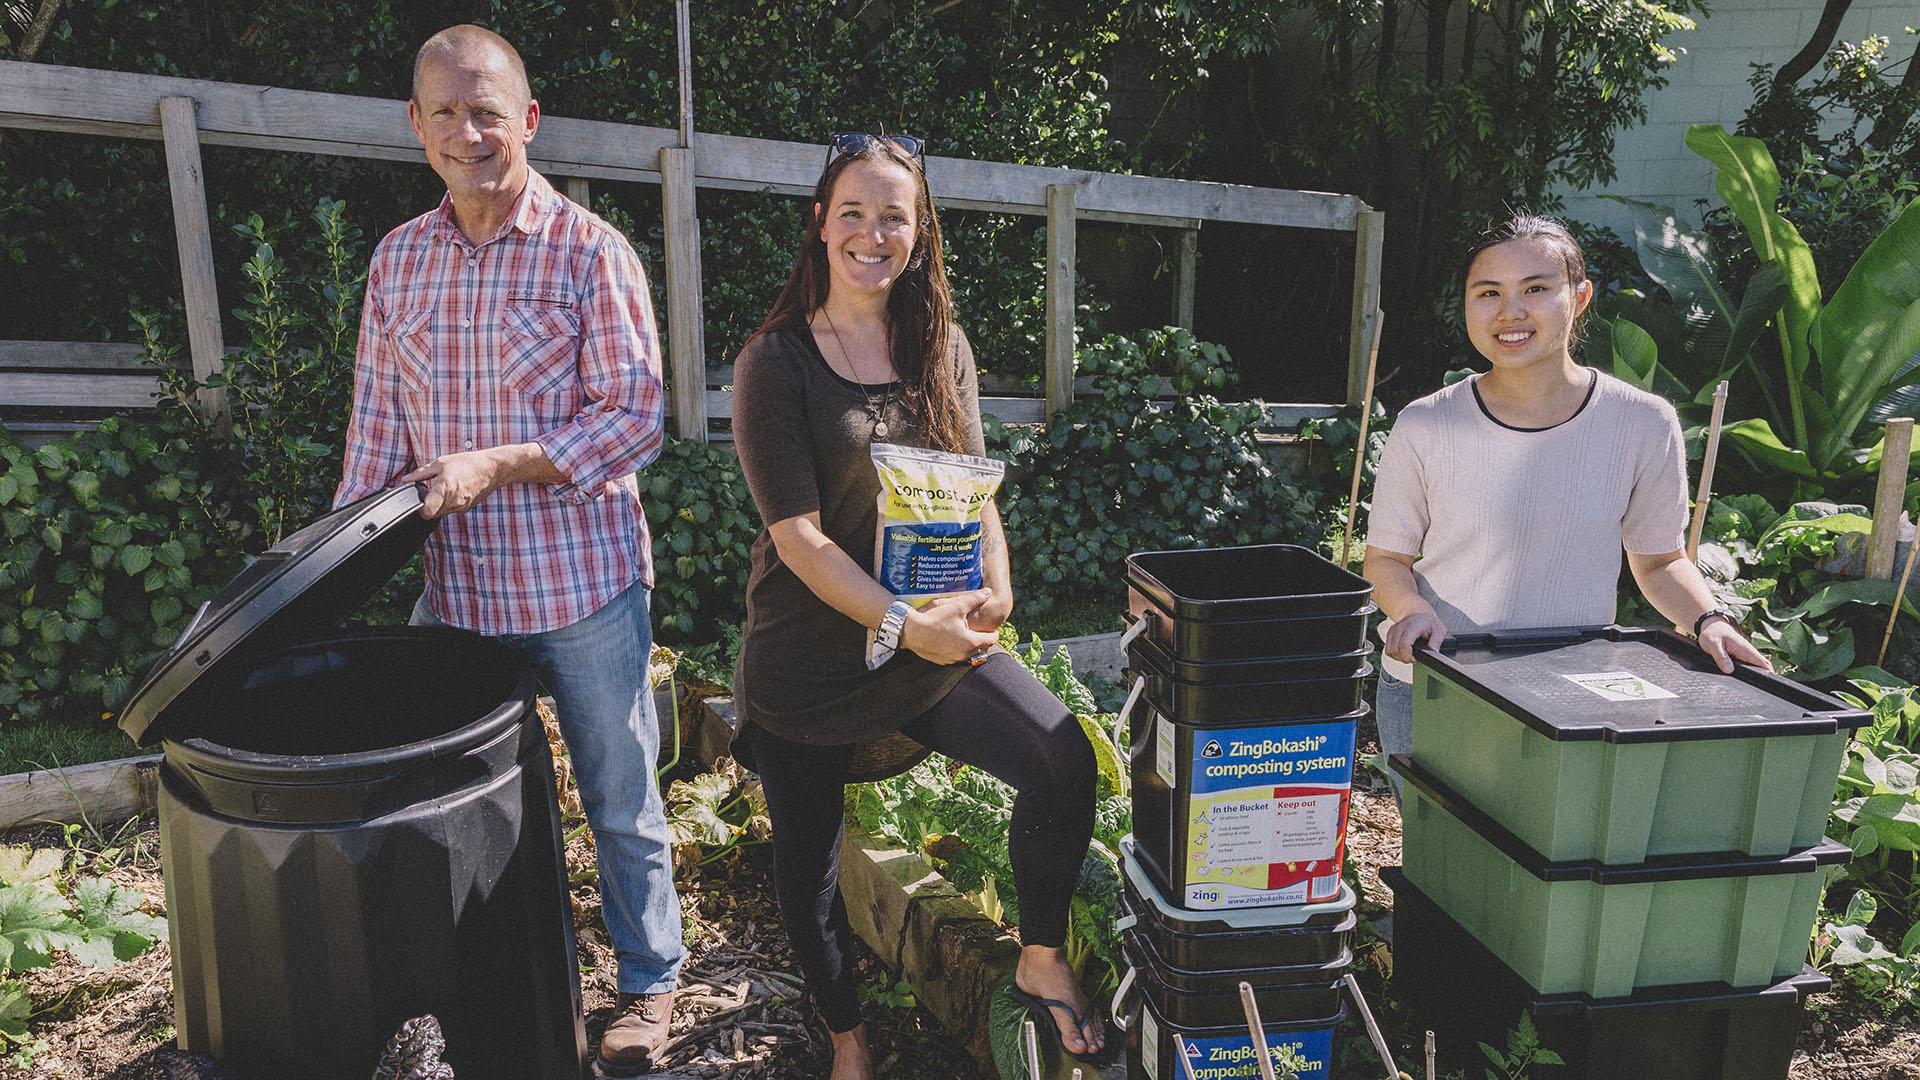 Compost Collective workshops